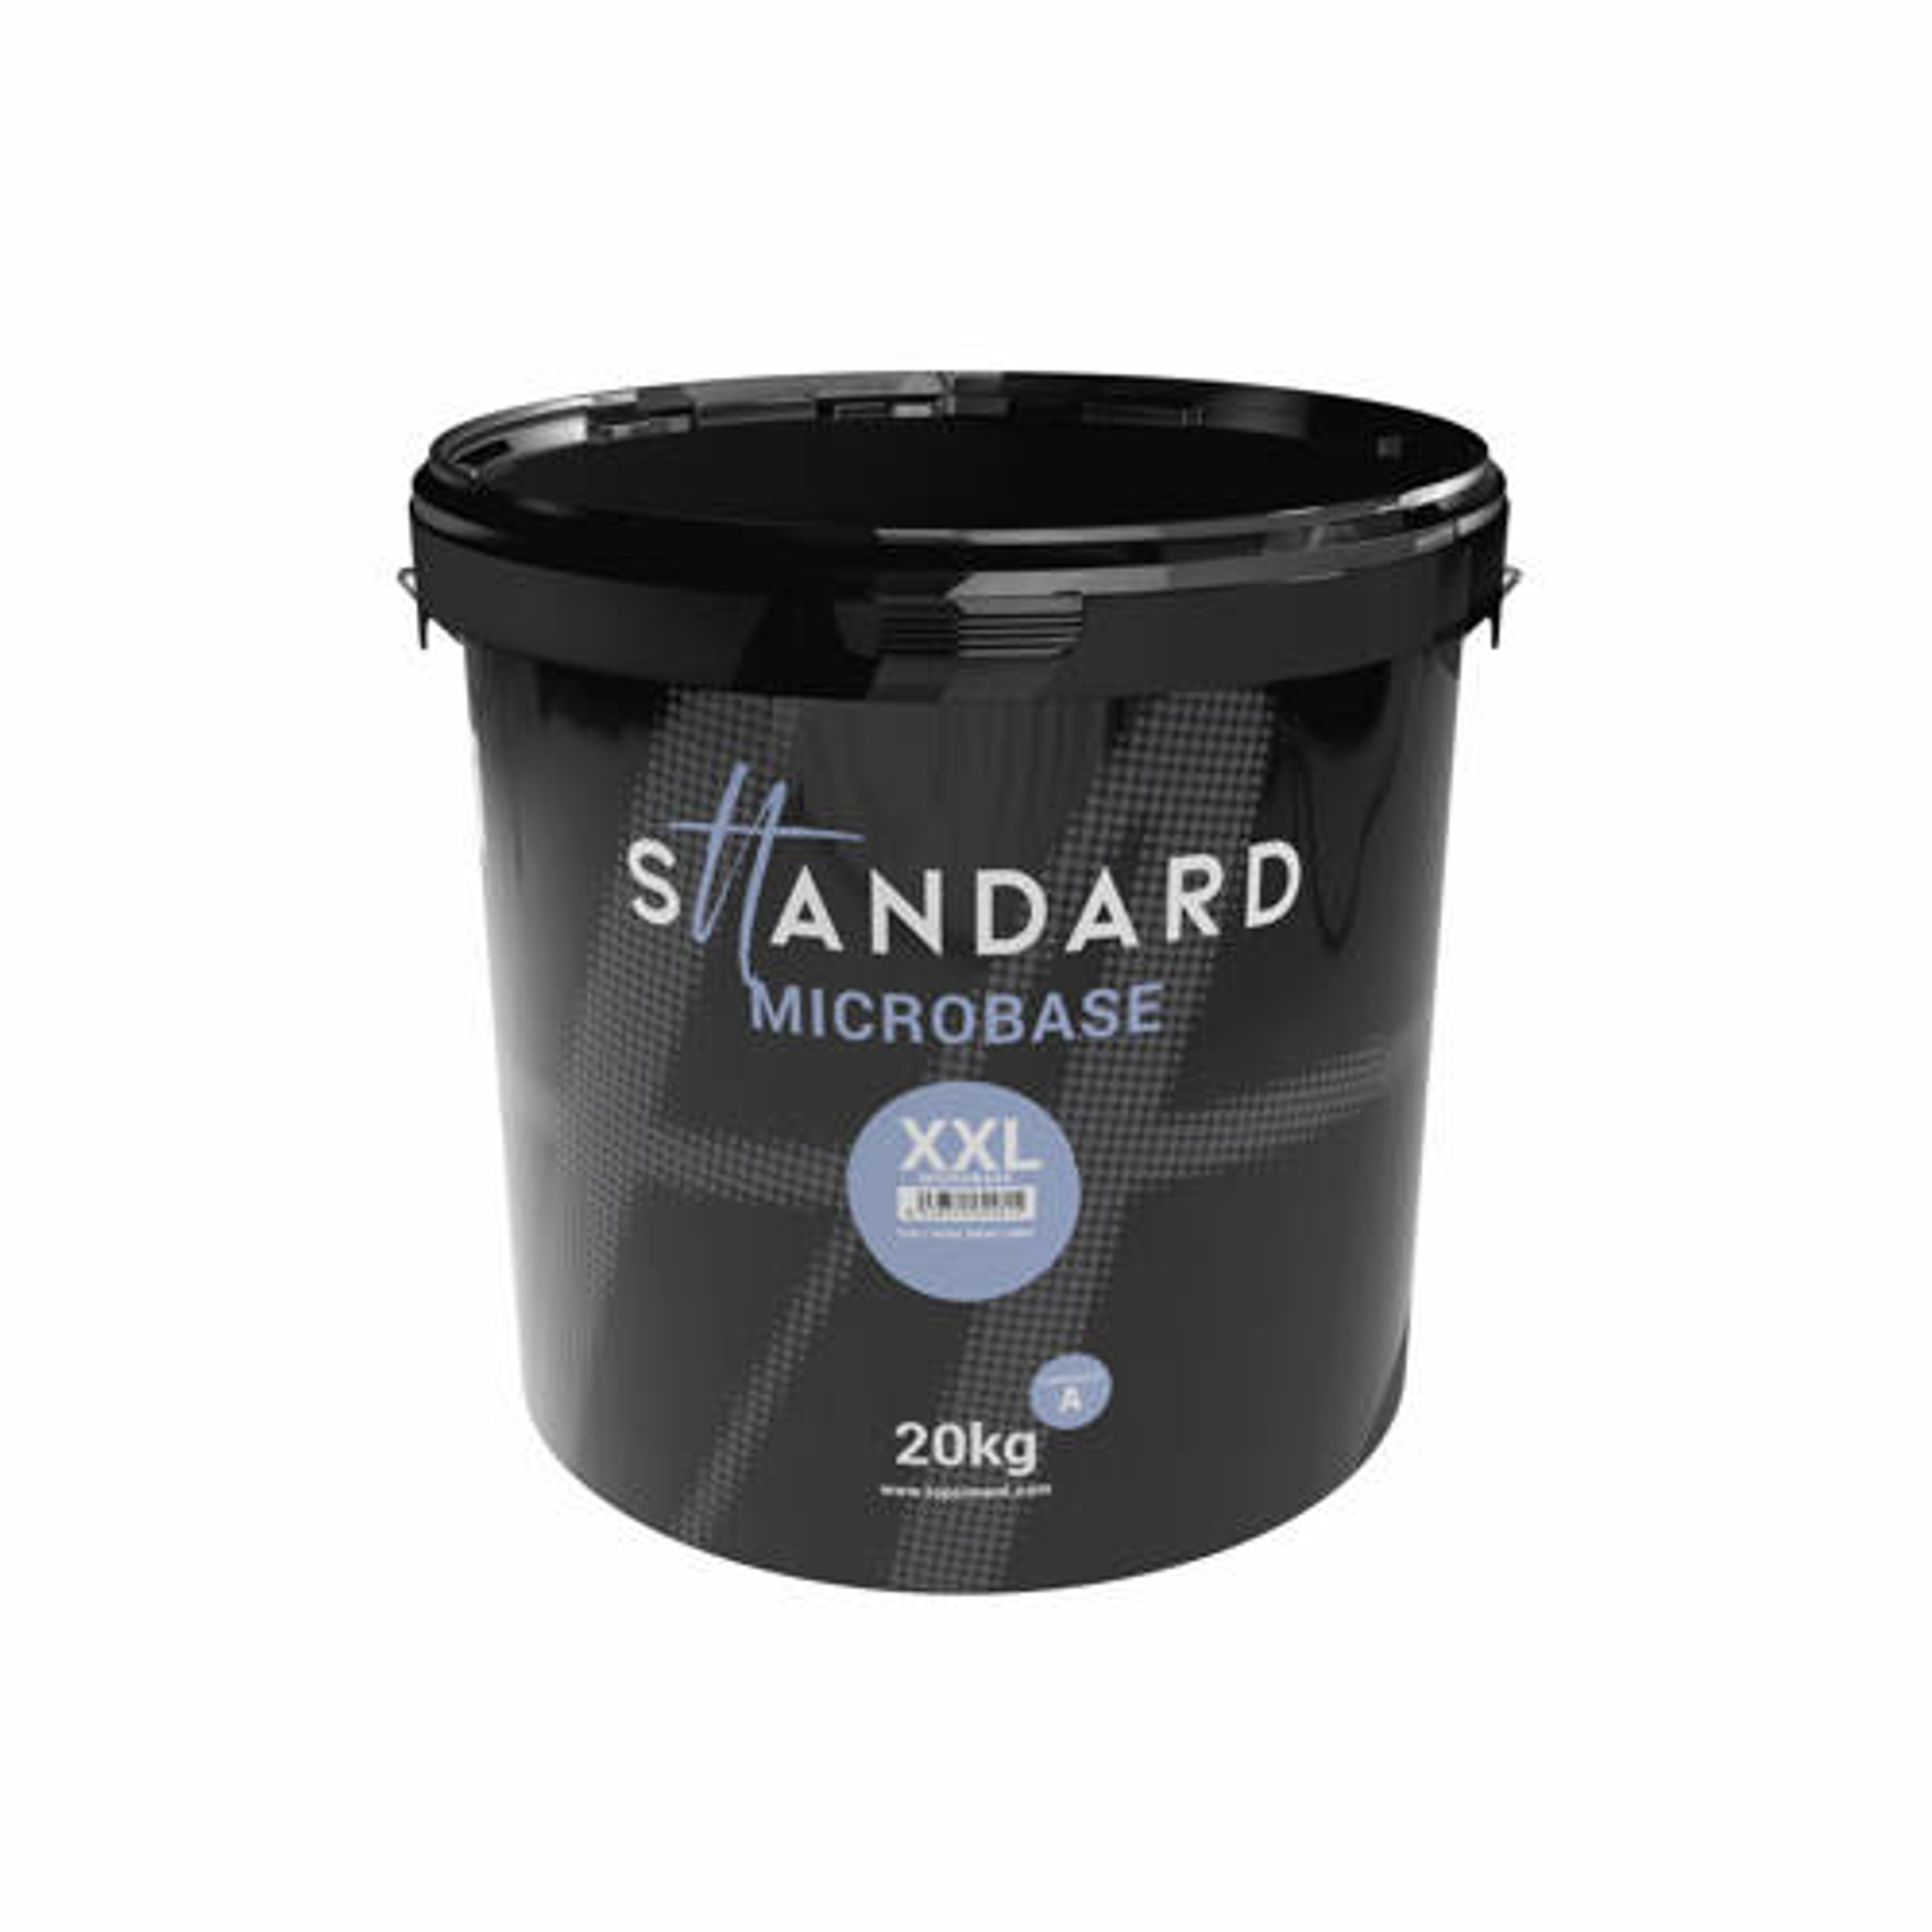 Sttandard Microbase XXL